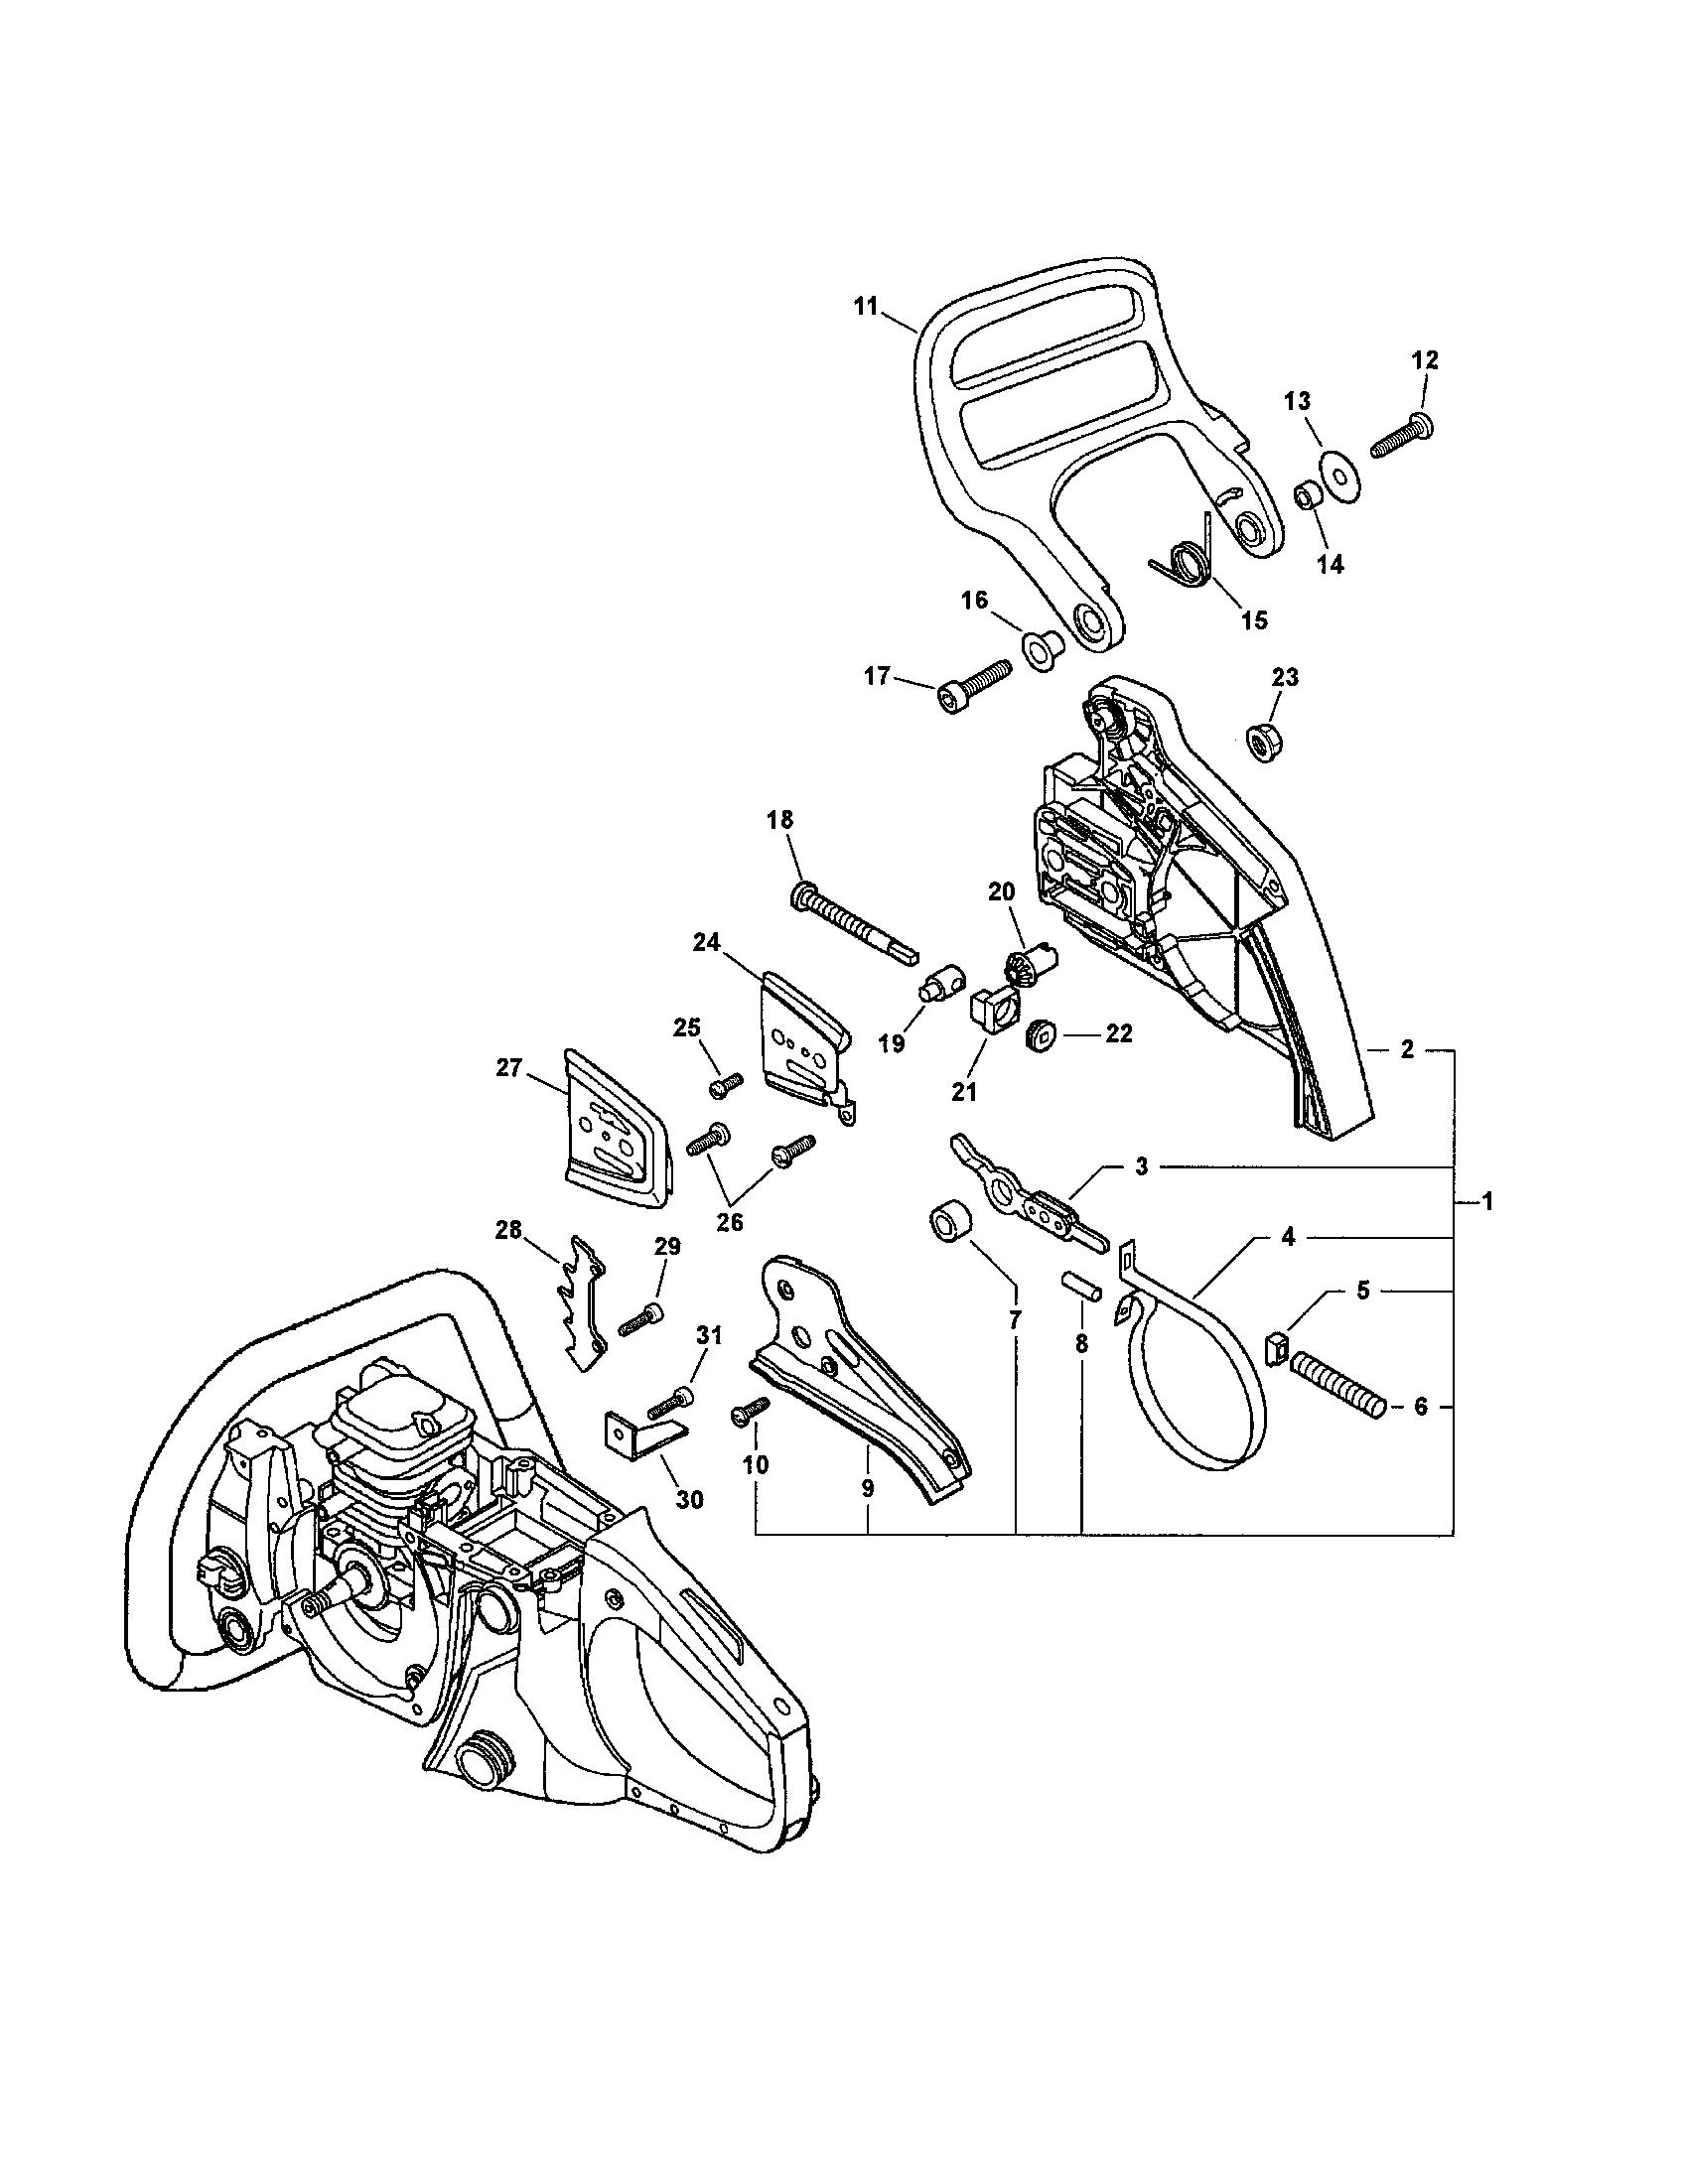 Homelite Wiring Diagram Cub Cadet Wiring Diagram Wiring